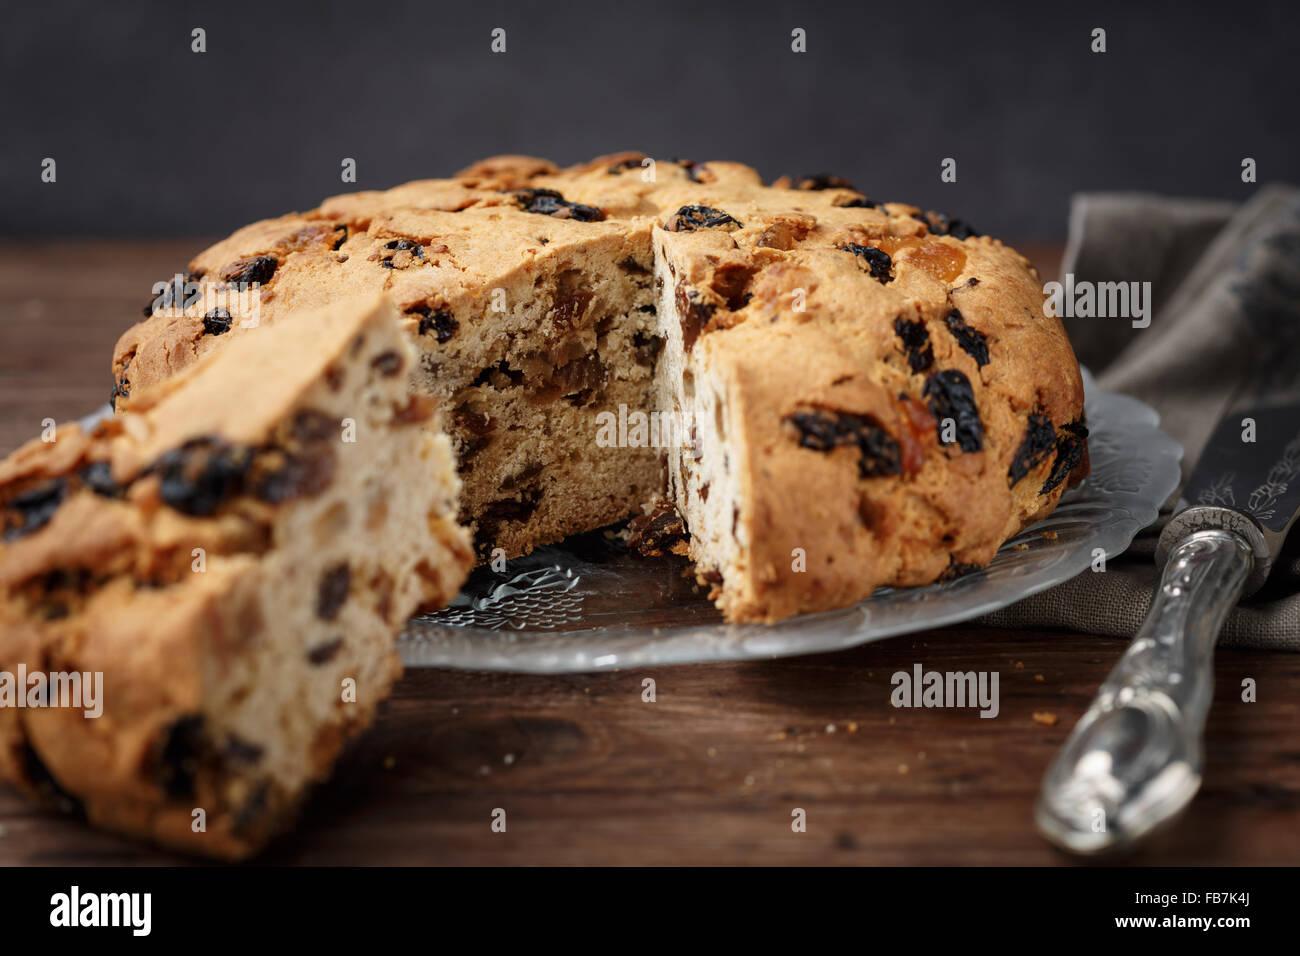 Pandolce Genovese (Genoa Cake) - Stock Image